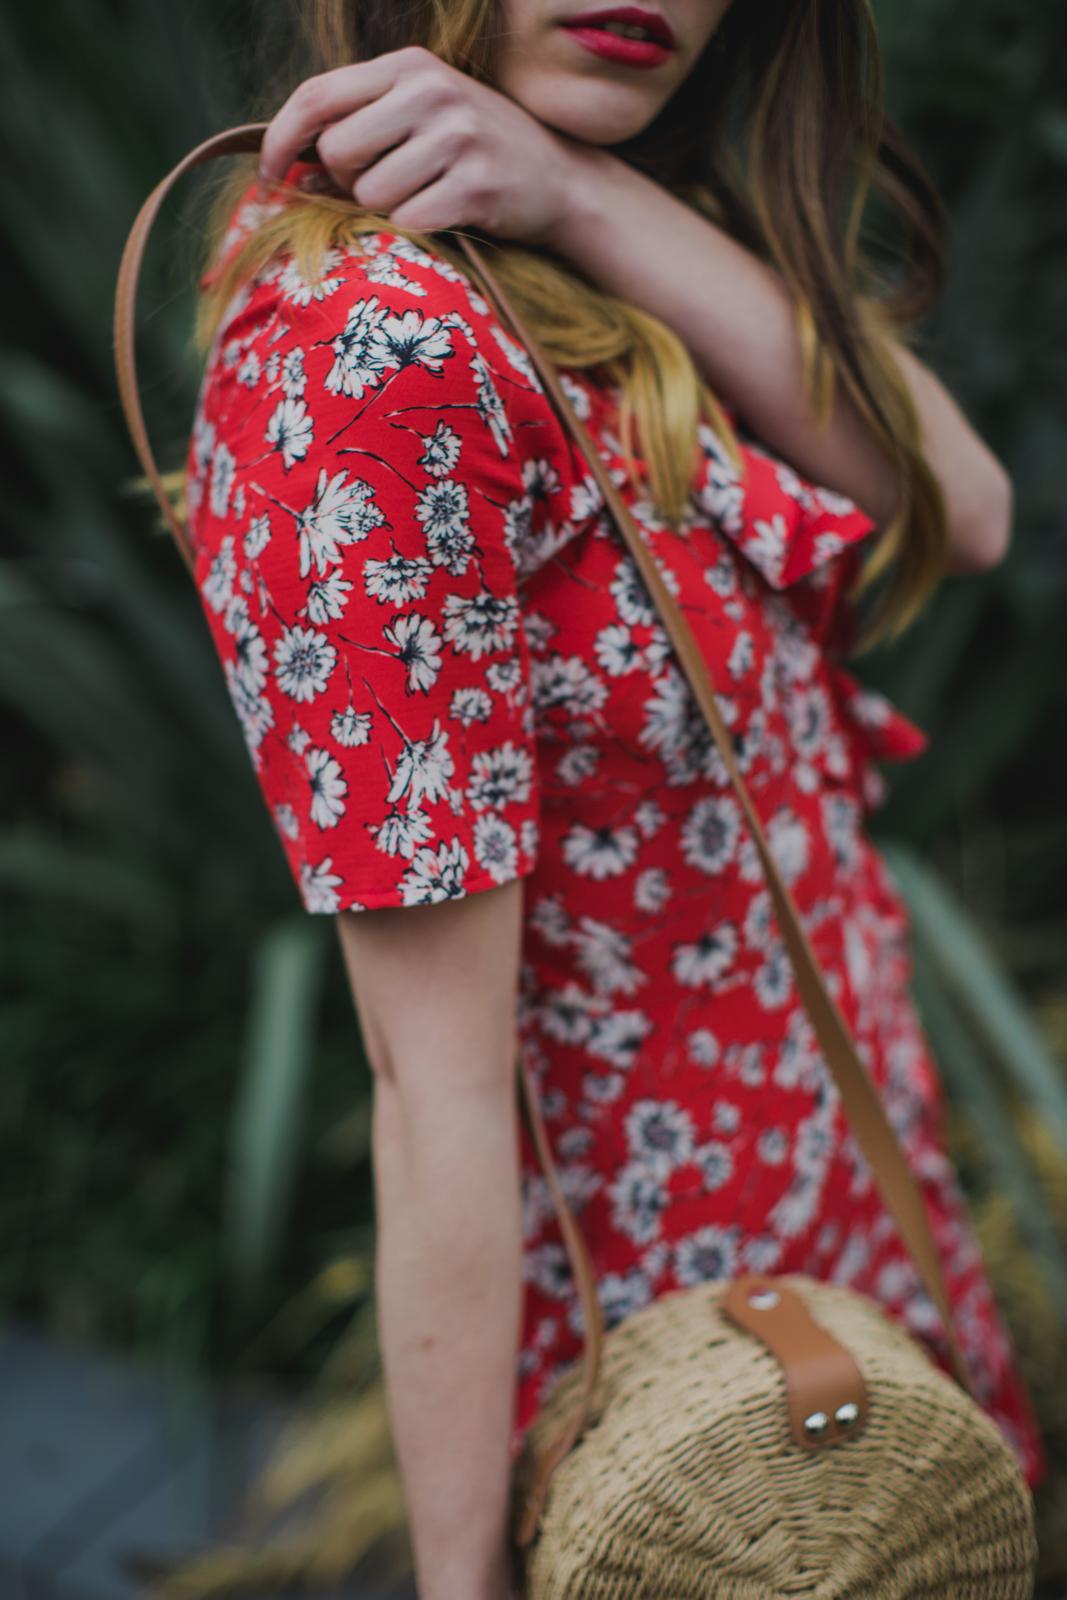 fashion-photographer-london-fashionstory-jasmina-haskovic-minas-planet-uk24.jpg